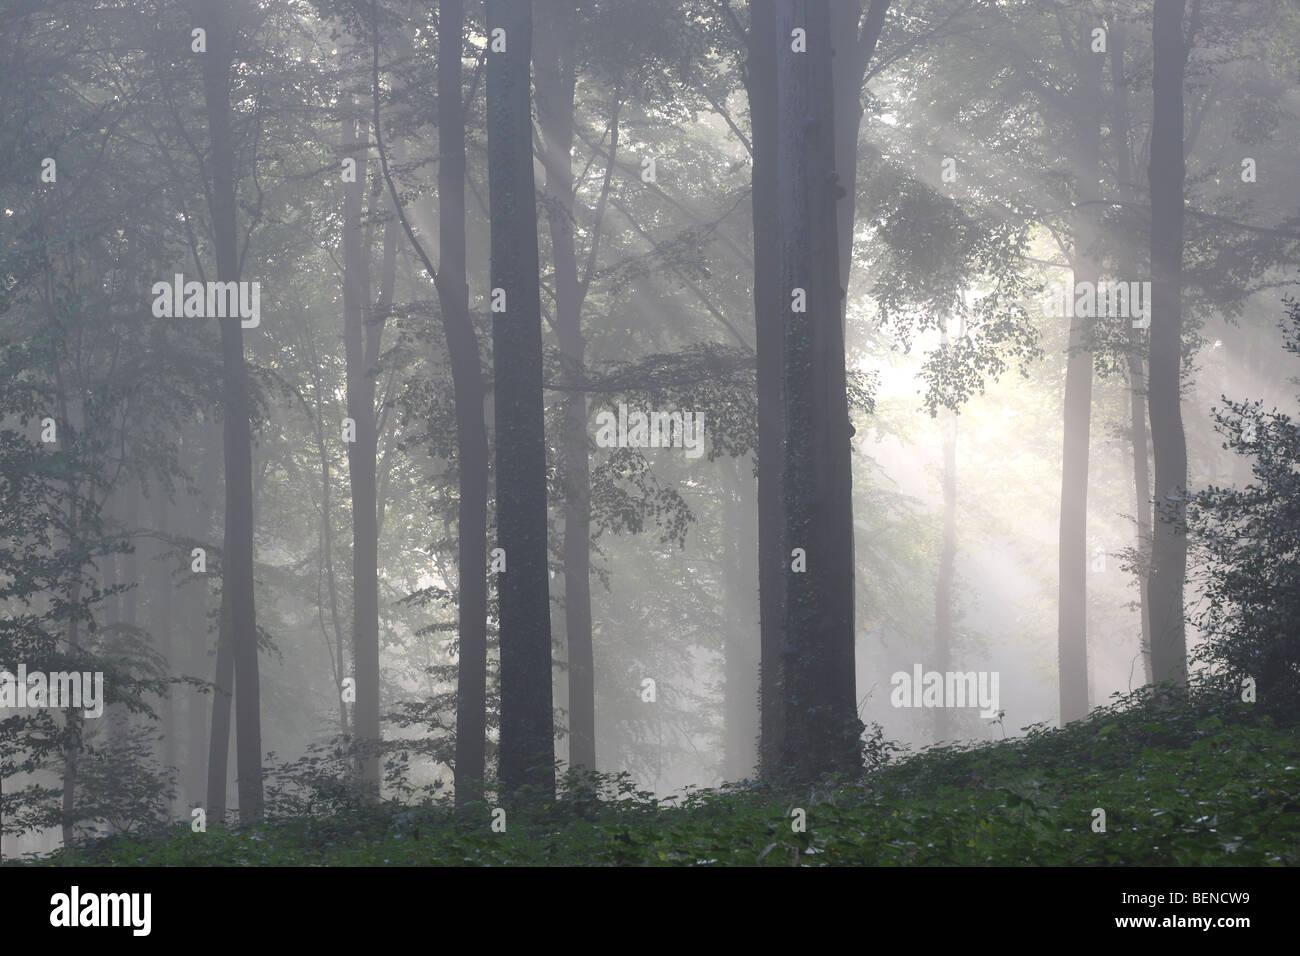 Beech forest (Fagus sylvatica) in mist, Flemish Ardennes, Belgium - Stock Image